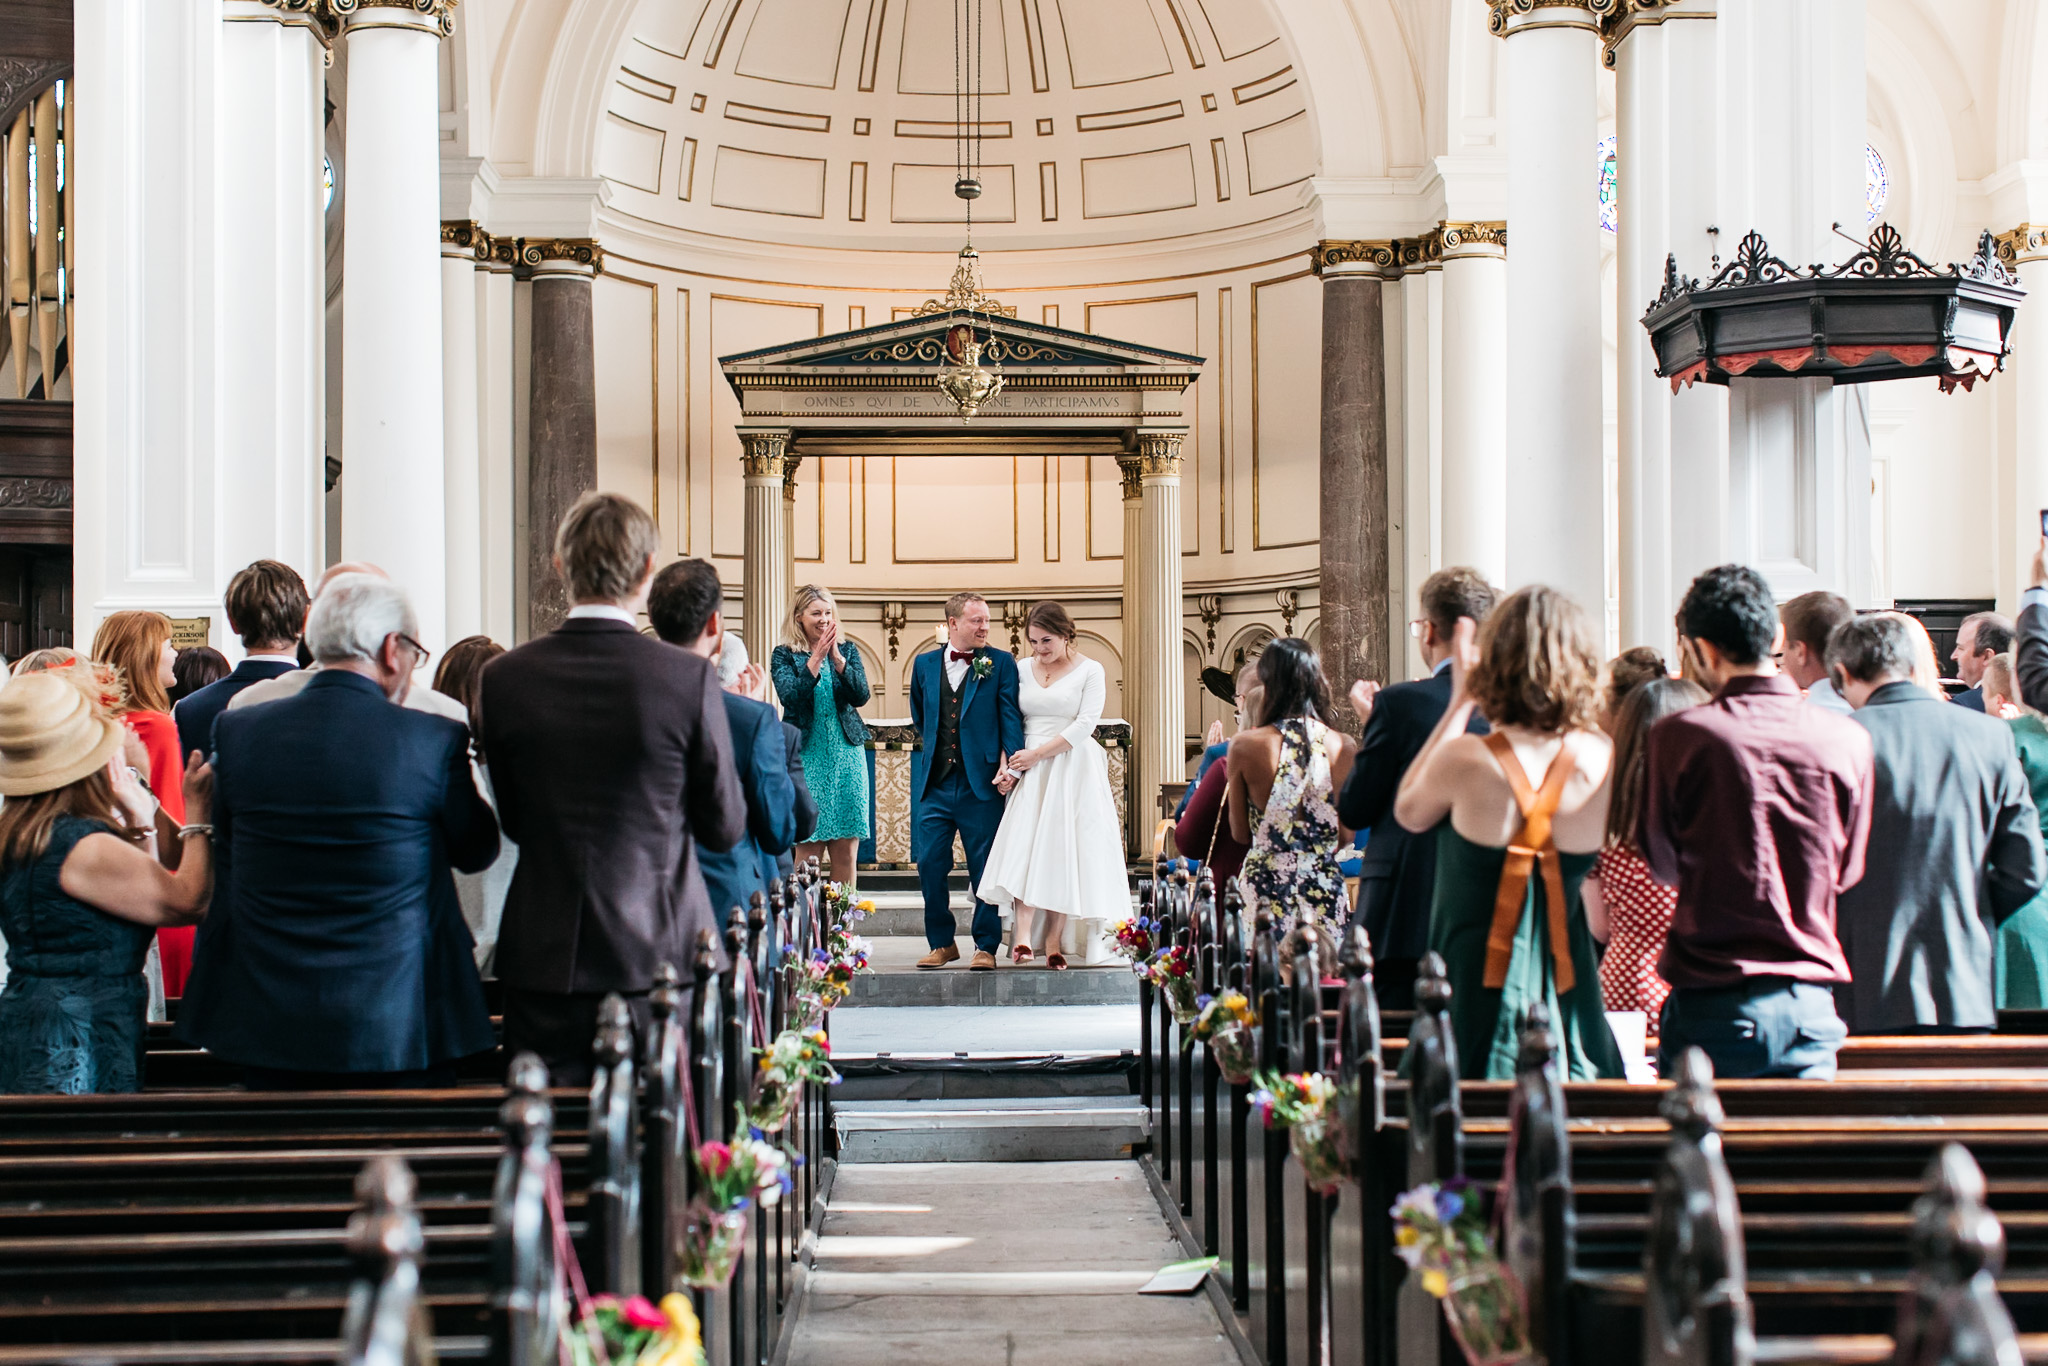 st_andrews_fabrica_brighton_wedding_564.jpg